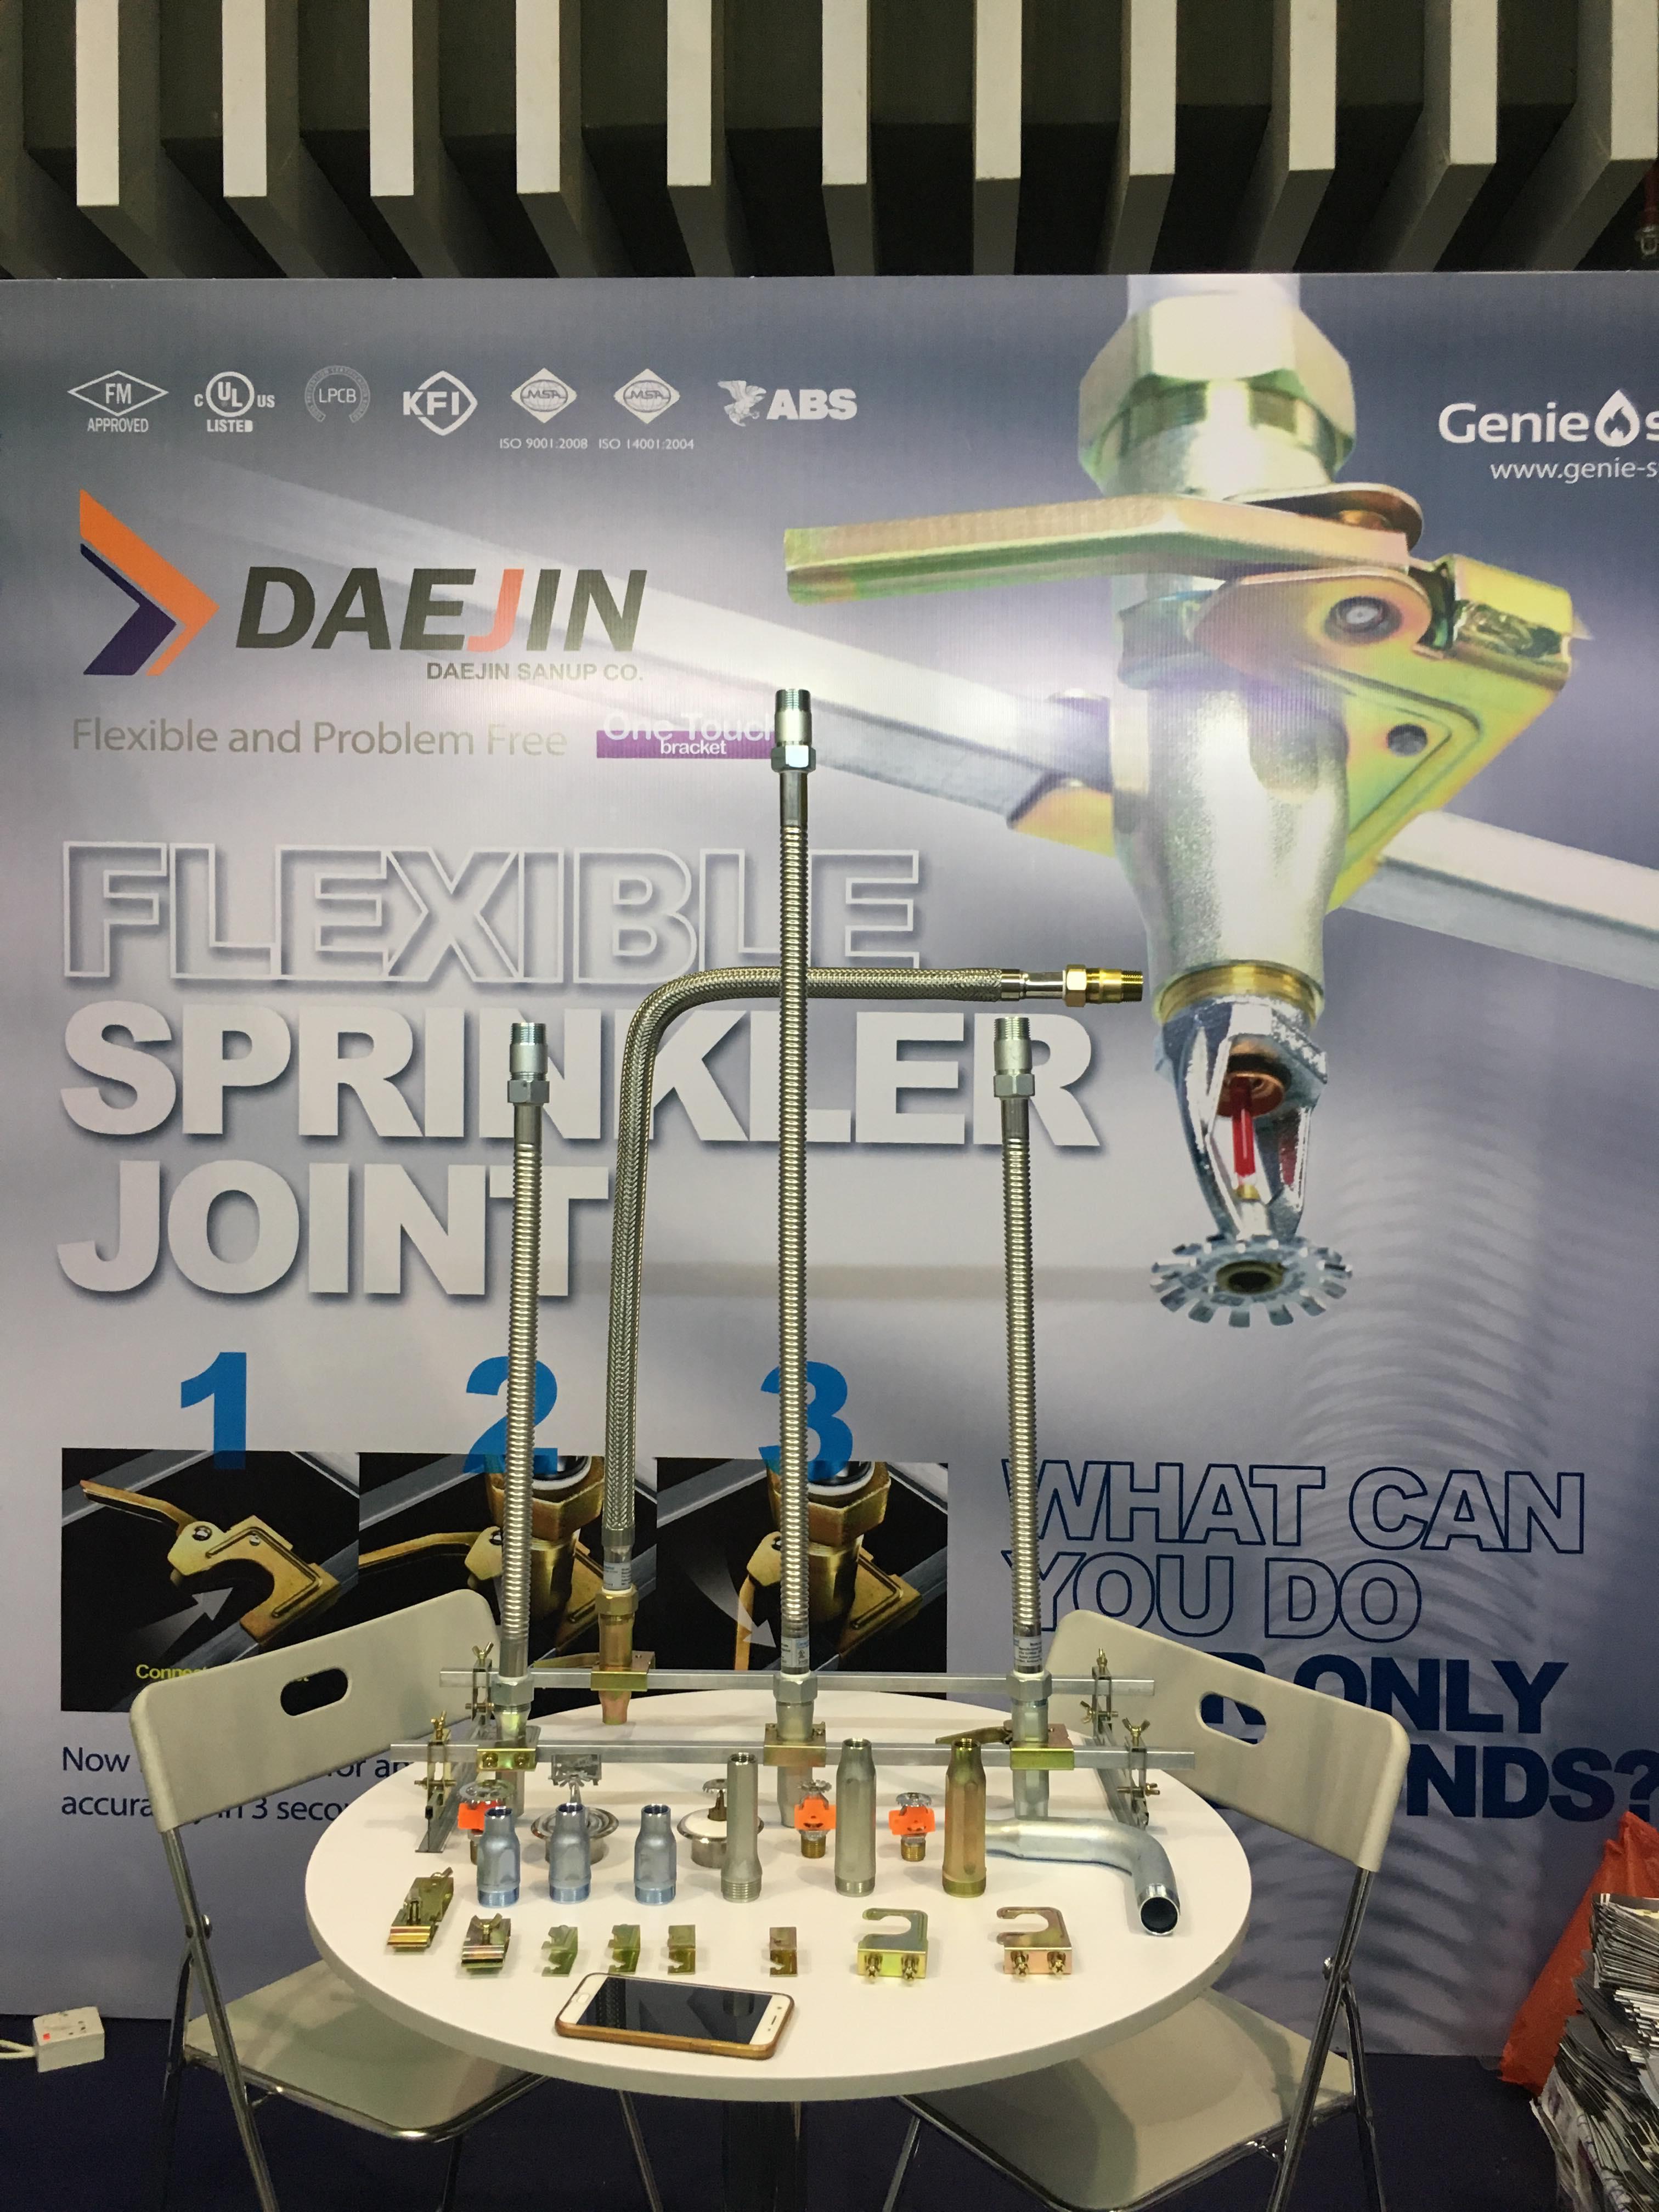 Dây mềm Daejin D25 nối sprinkler D20, 700mm áp lực 175psi UL